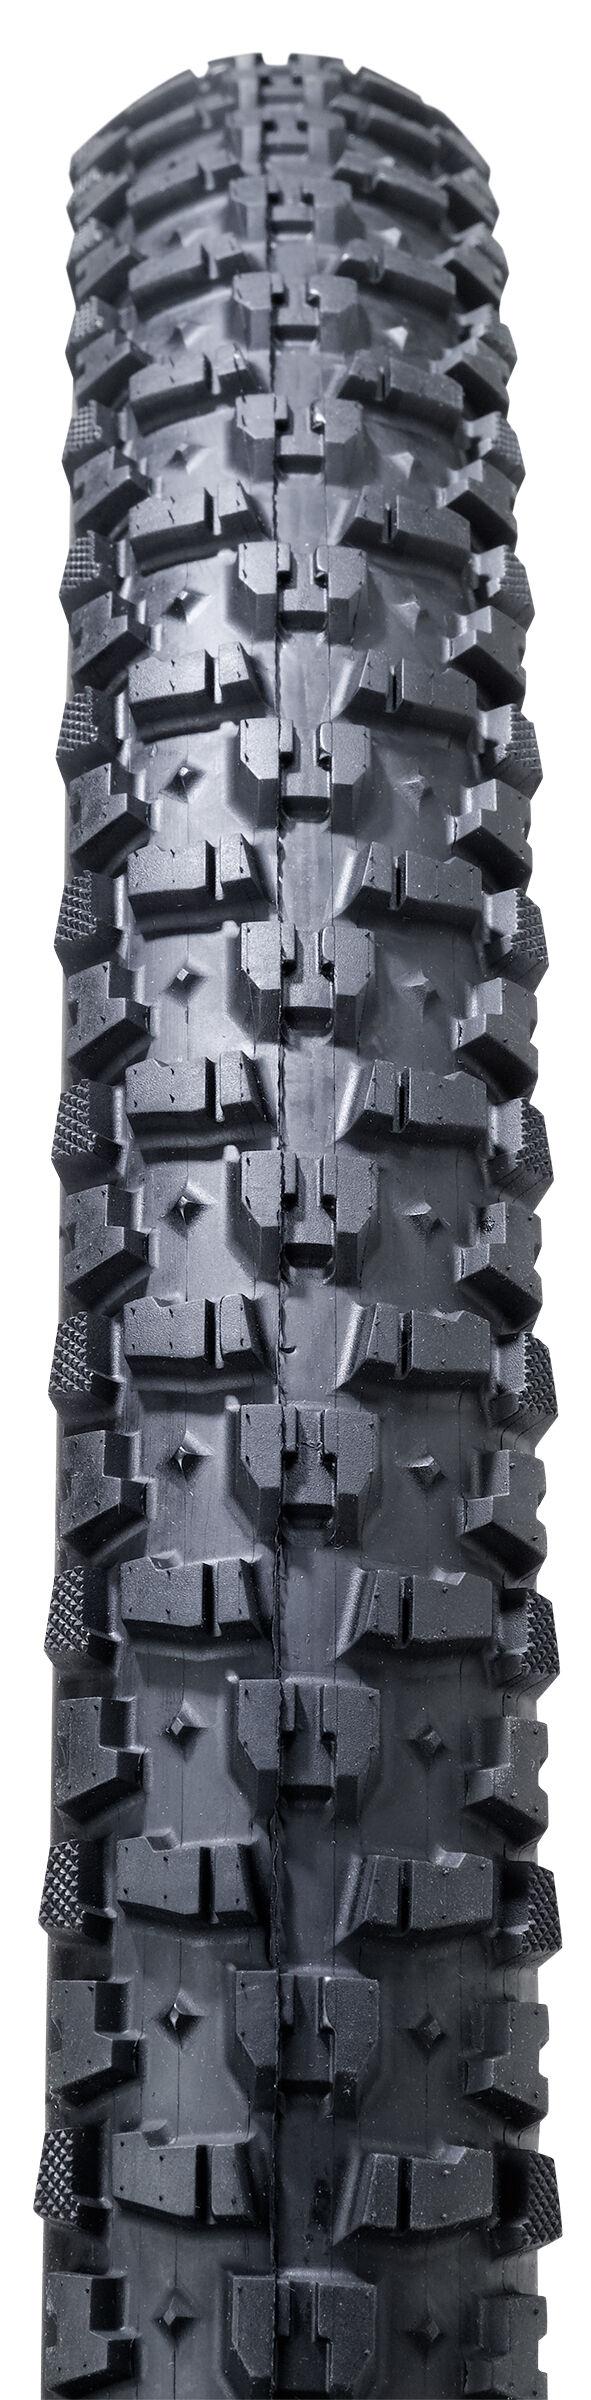 "Axis 27.5"" Folding MTB Tire 27.5 x 2.25"